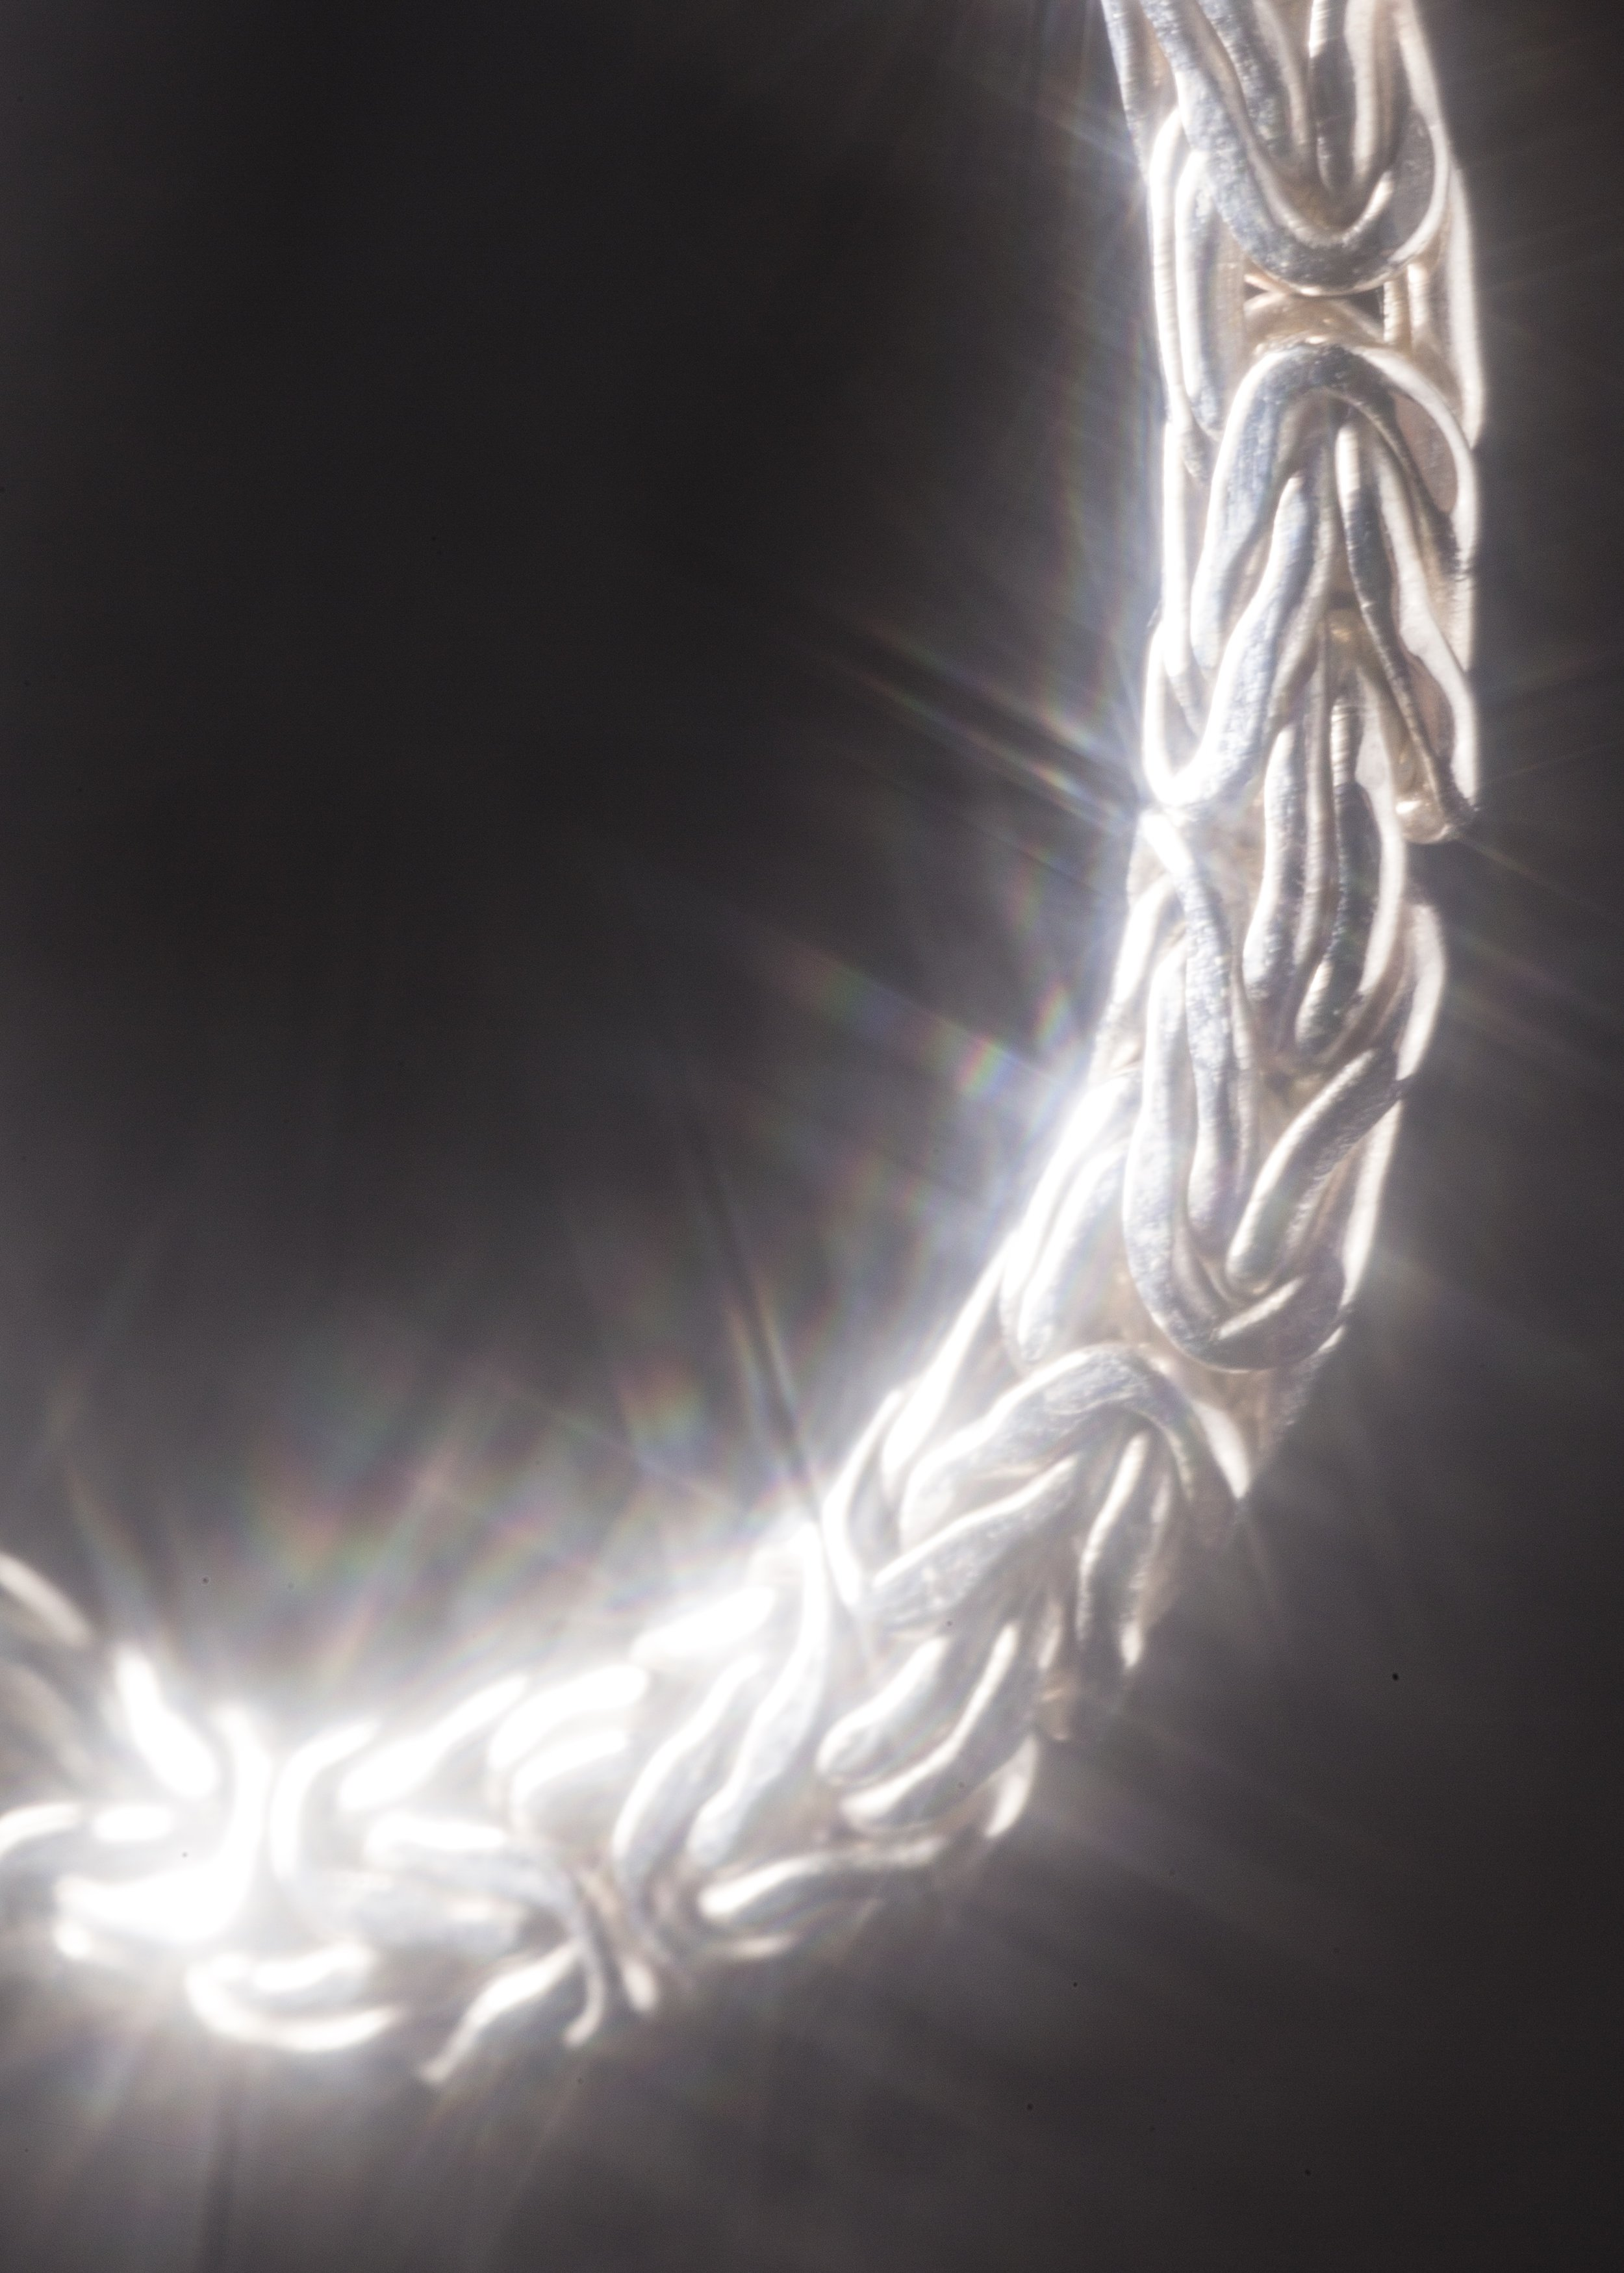 1718_S2_3BAPH_Corda-Margaux_Diplôme_Journey_Projection_73.jpeg